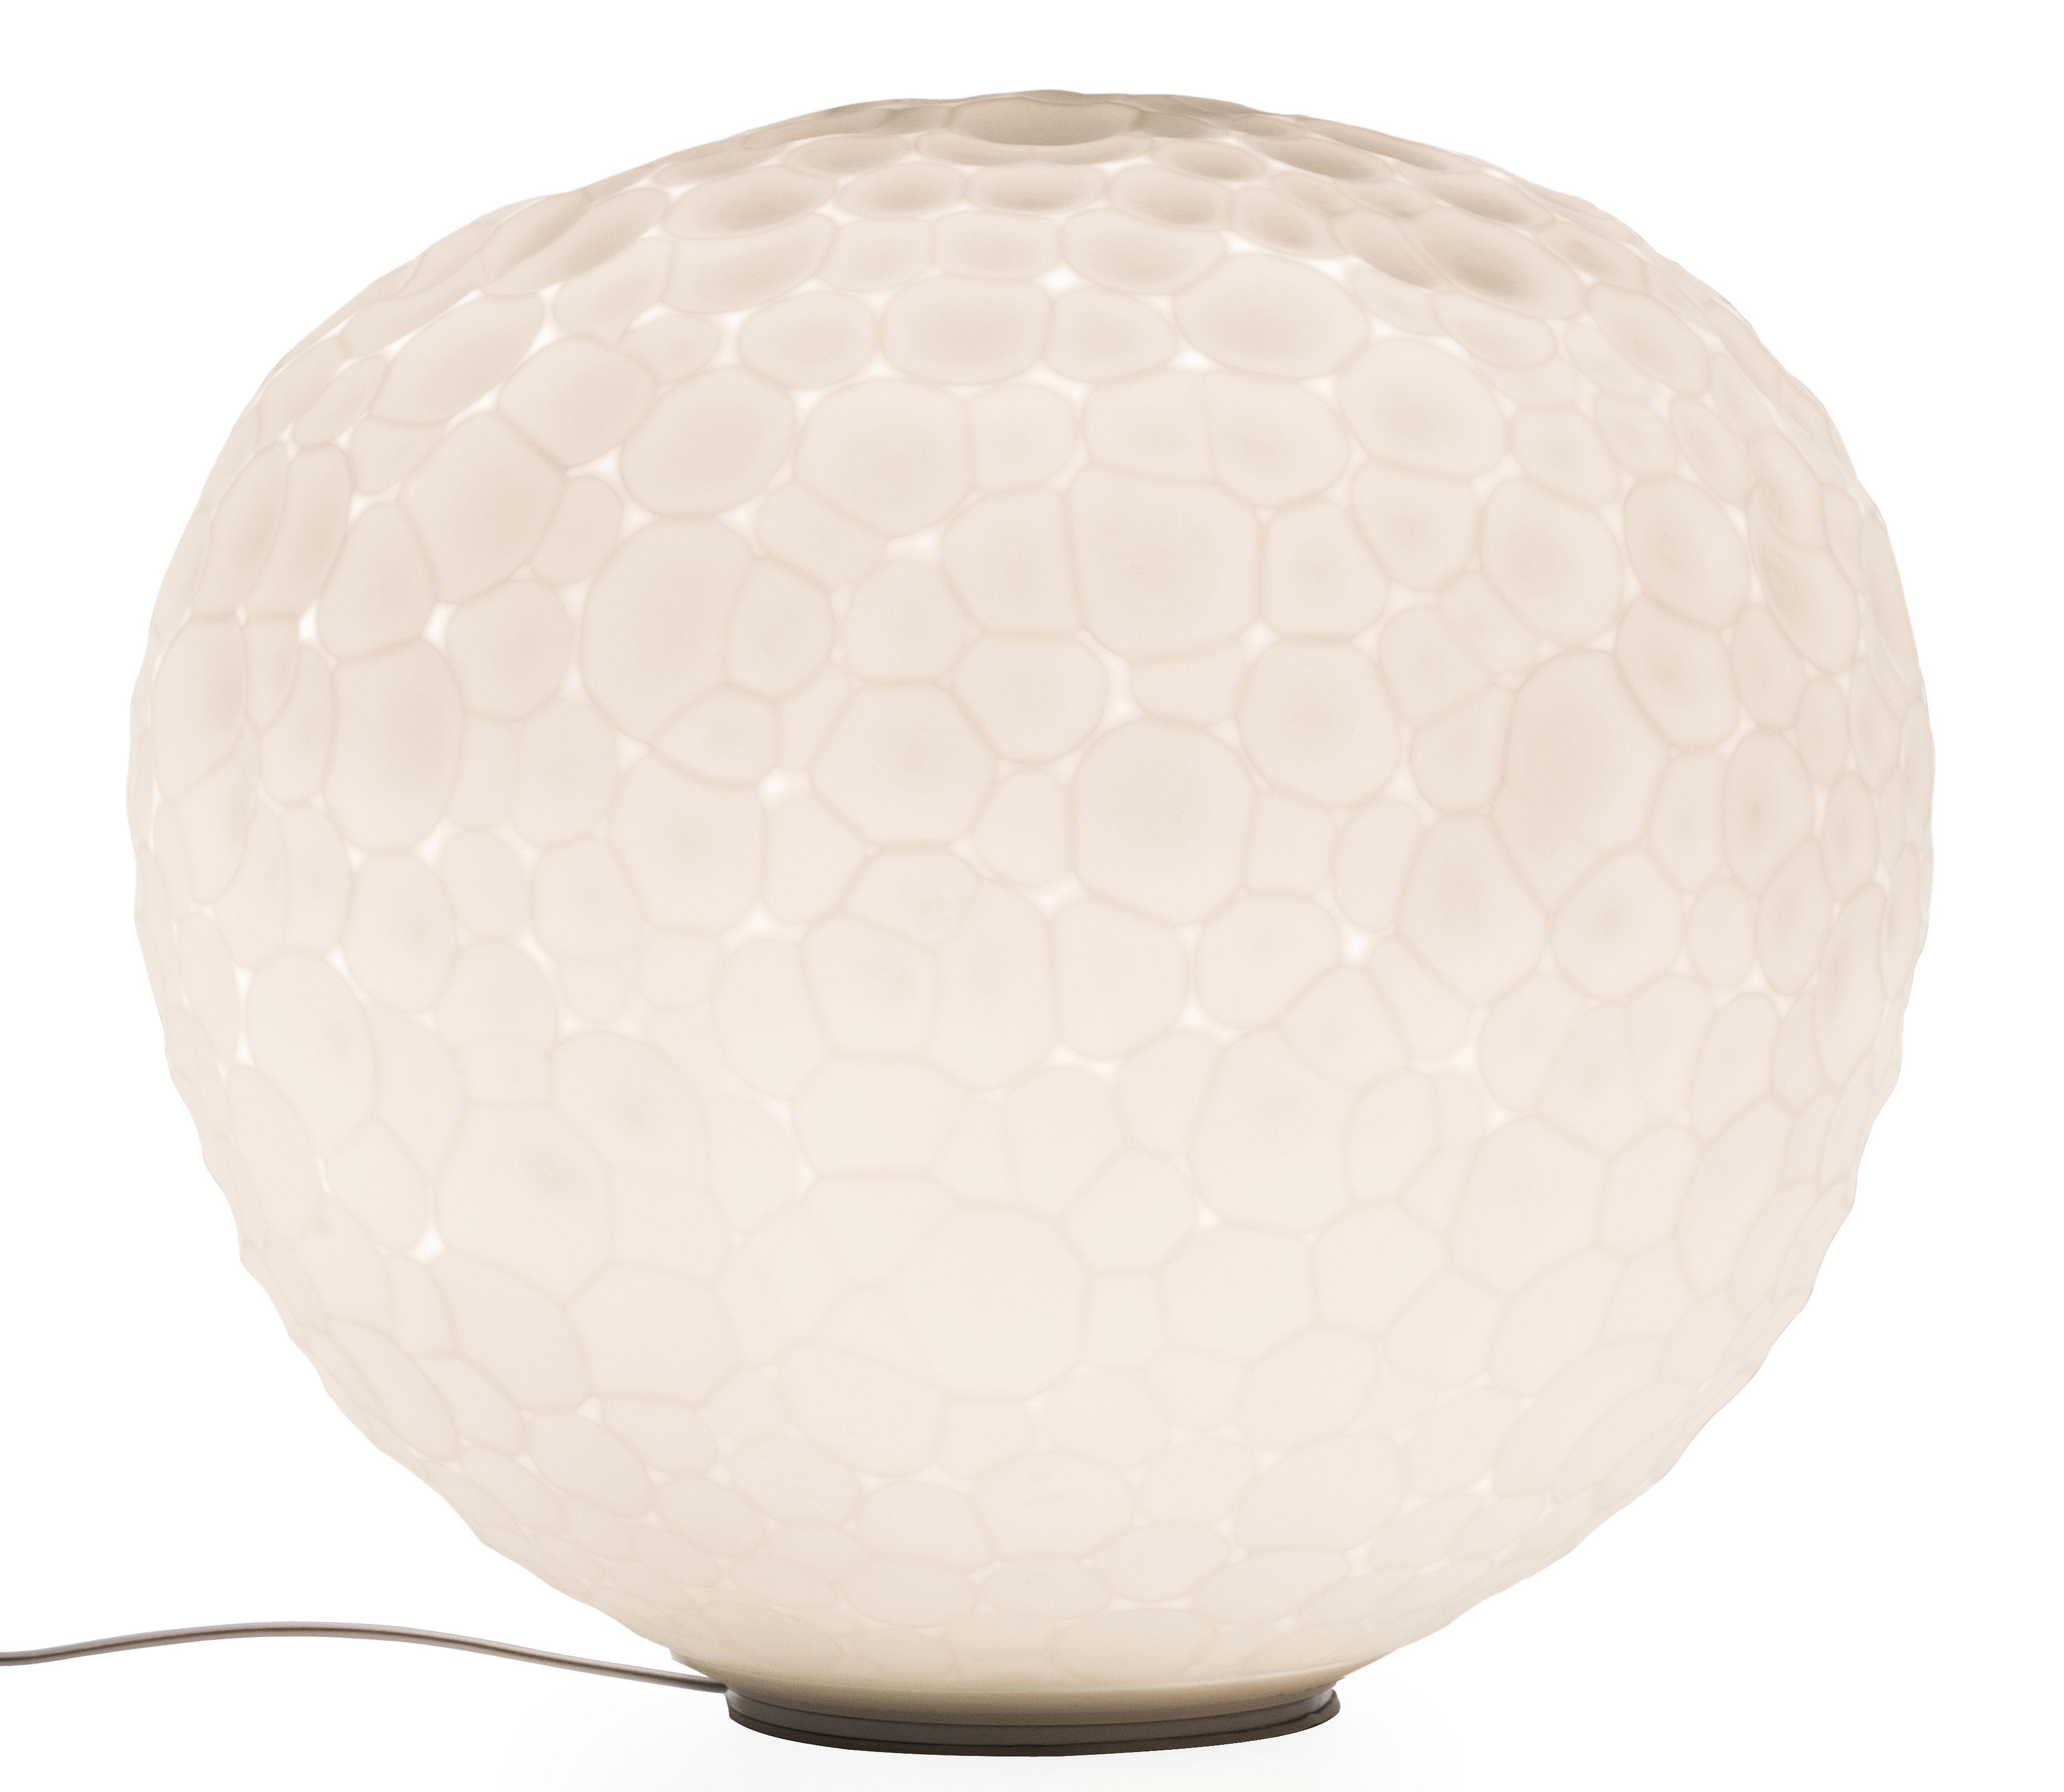 Lighting - Table Lamps - Meteorite Table lamp - Ø 35 cm by Artemide - White - Blown glass